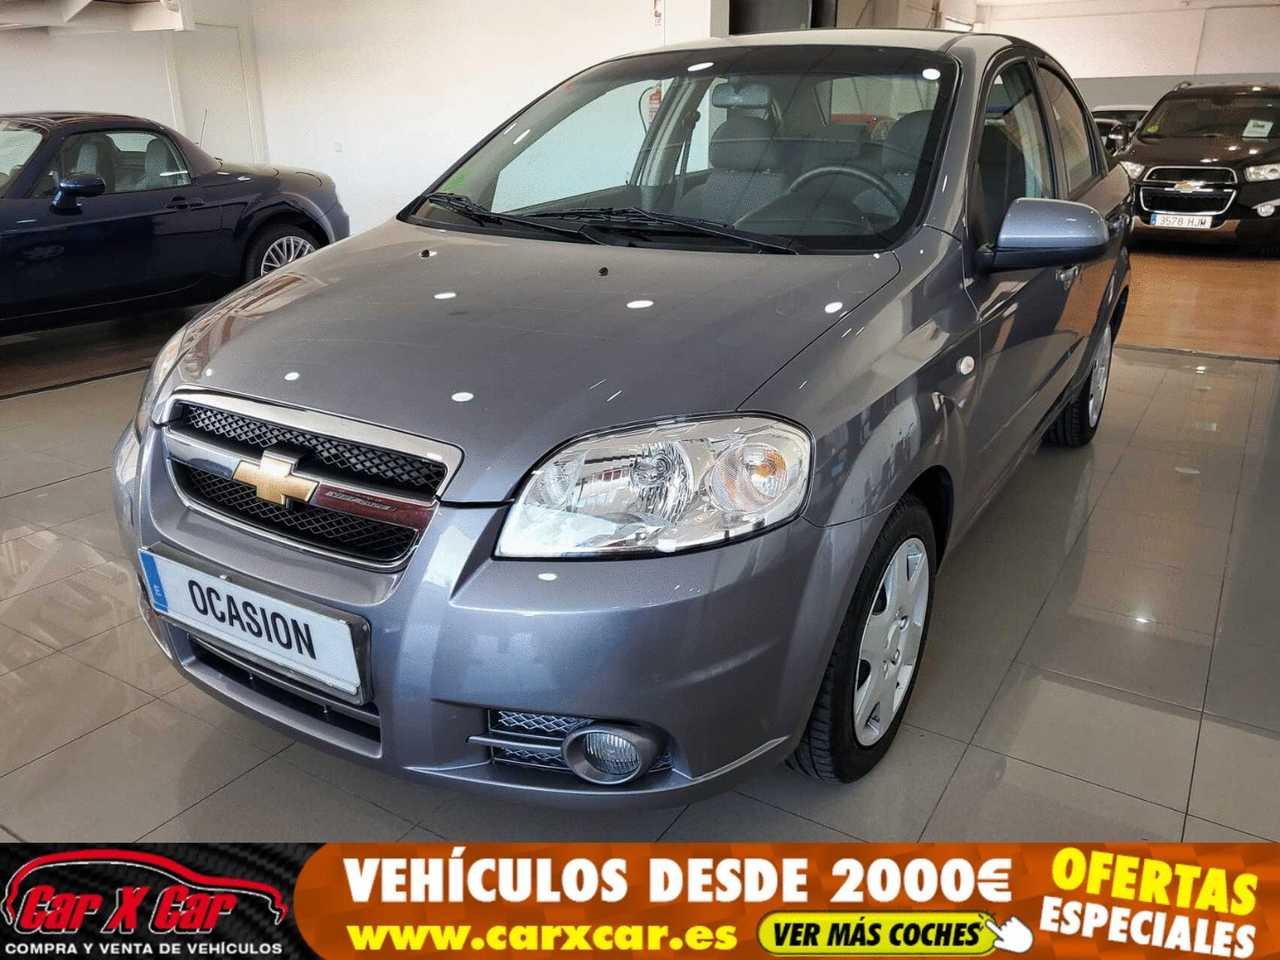 Chevrolet Aveo 1.4 16v LS   - Foto 1